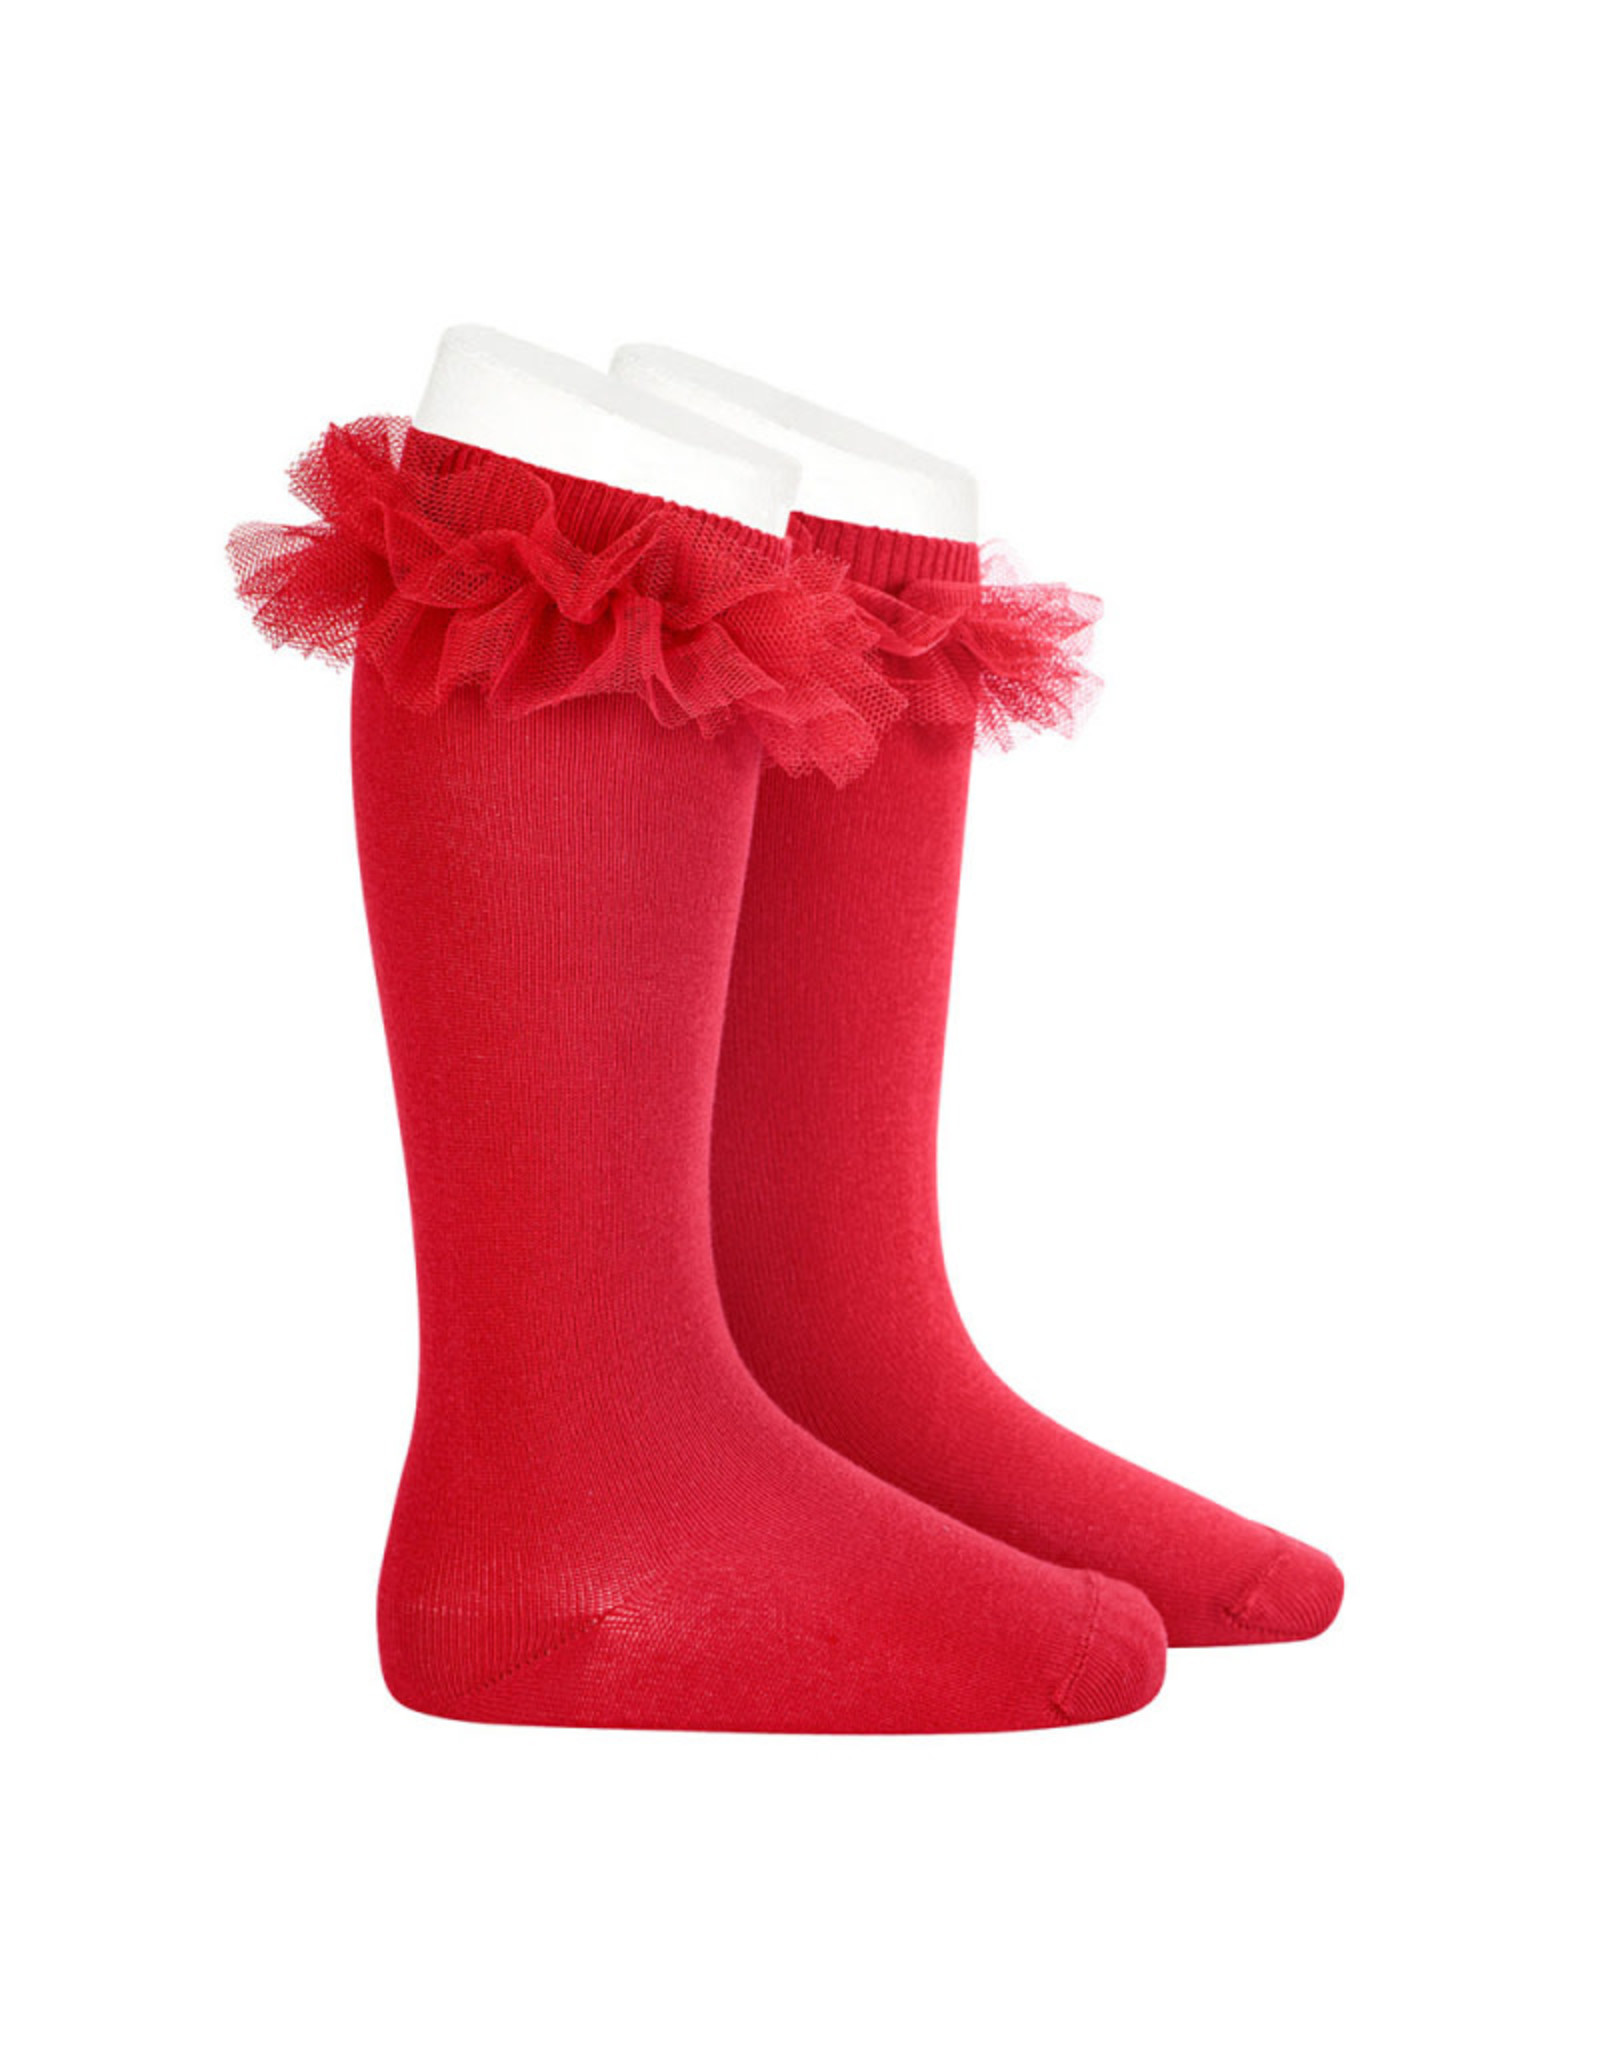 CONDOR Red Tulle Ruffle Knee Socks